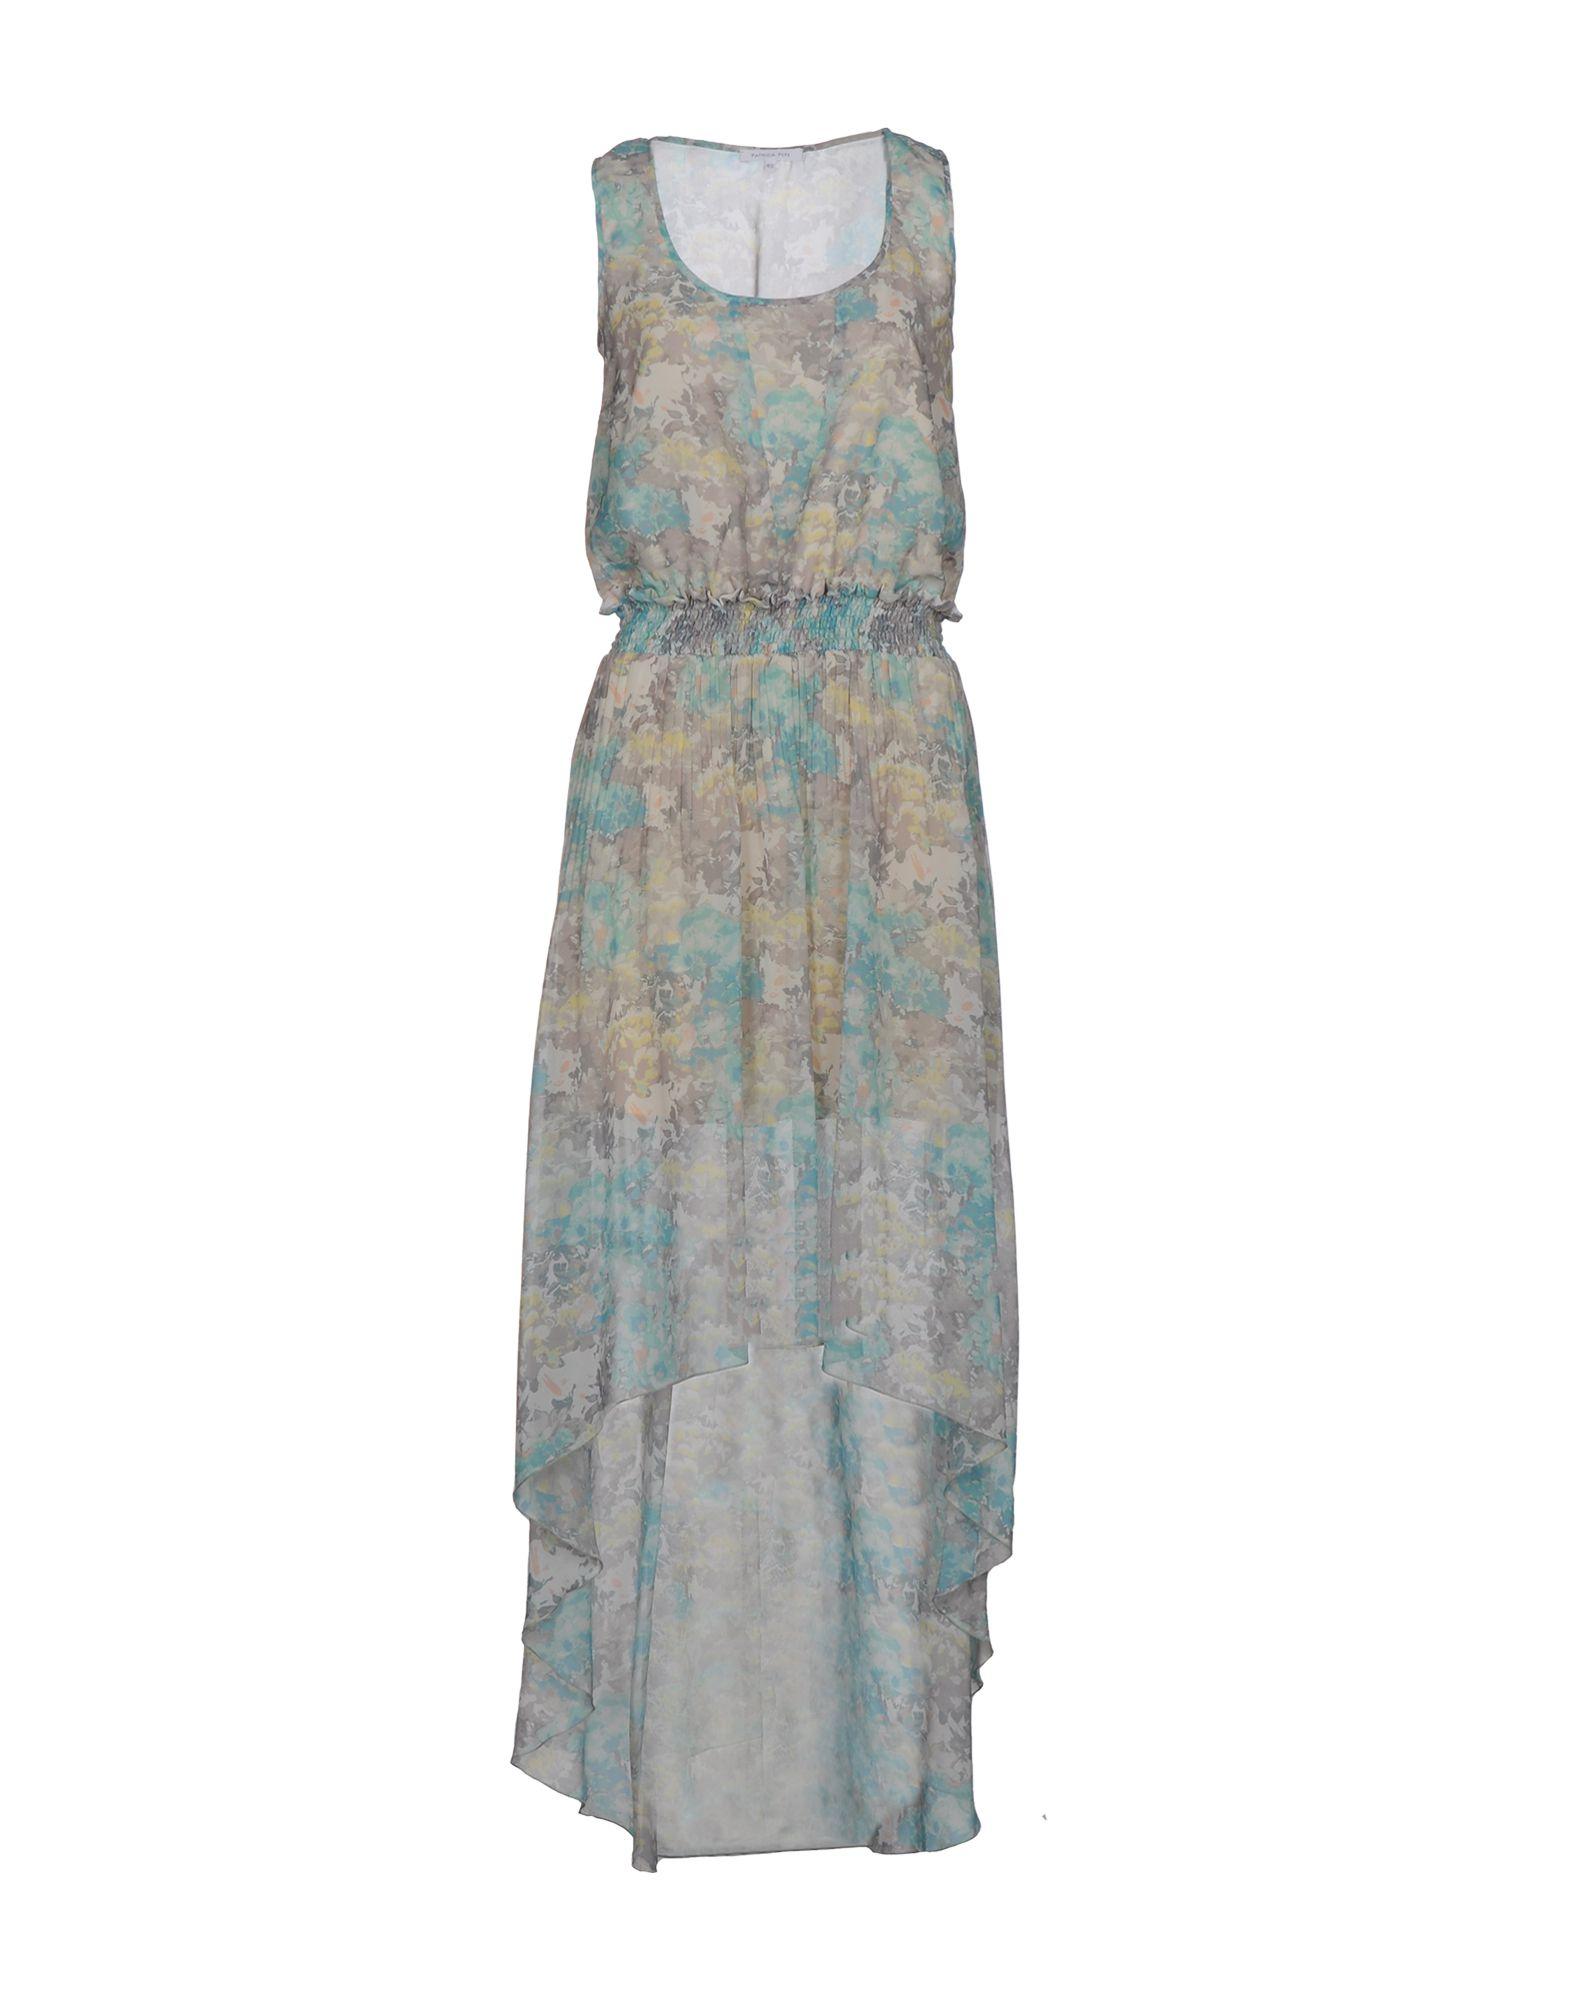 PATRIZIA PEPE Платье длиной 3/4 lisa corti платье длиной 3 4